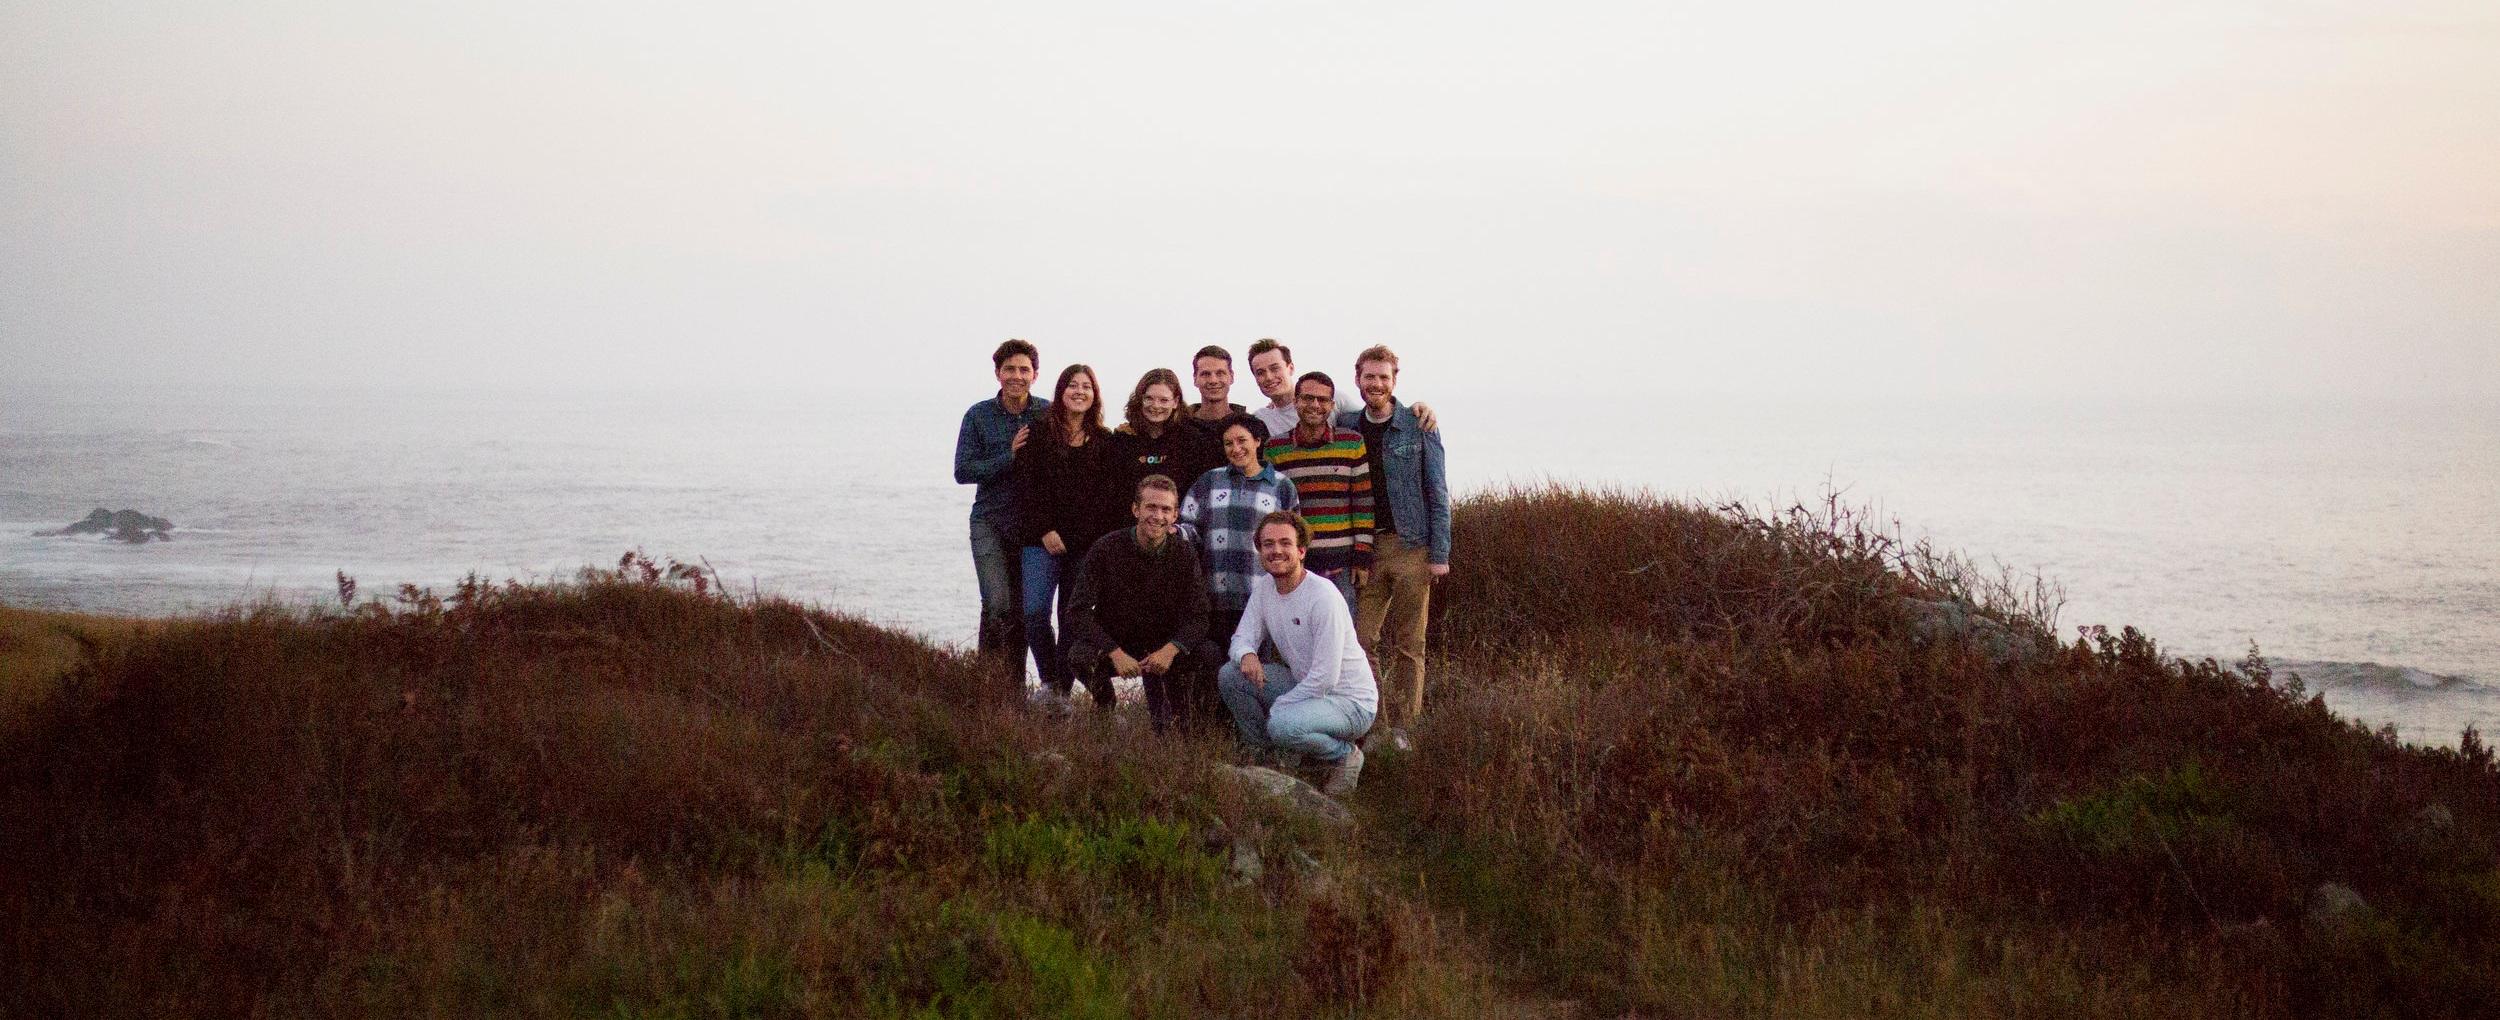 Summerhouse+Crew+Photo.jpg